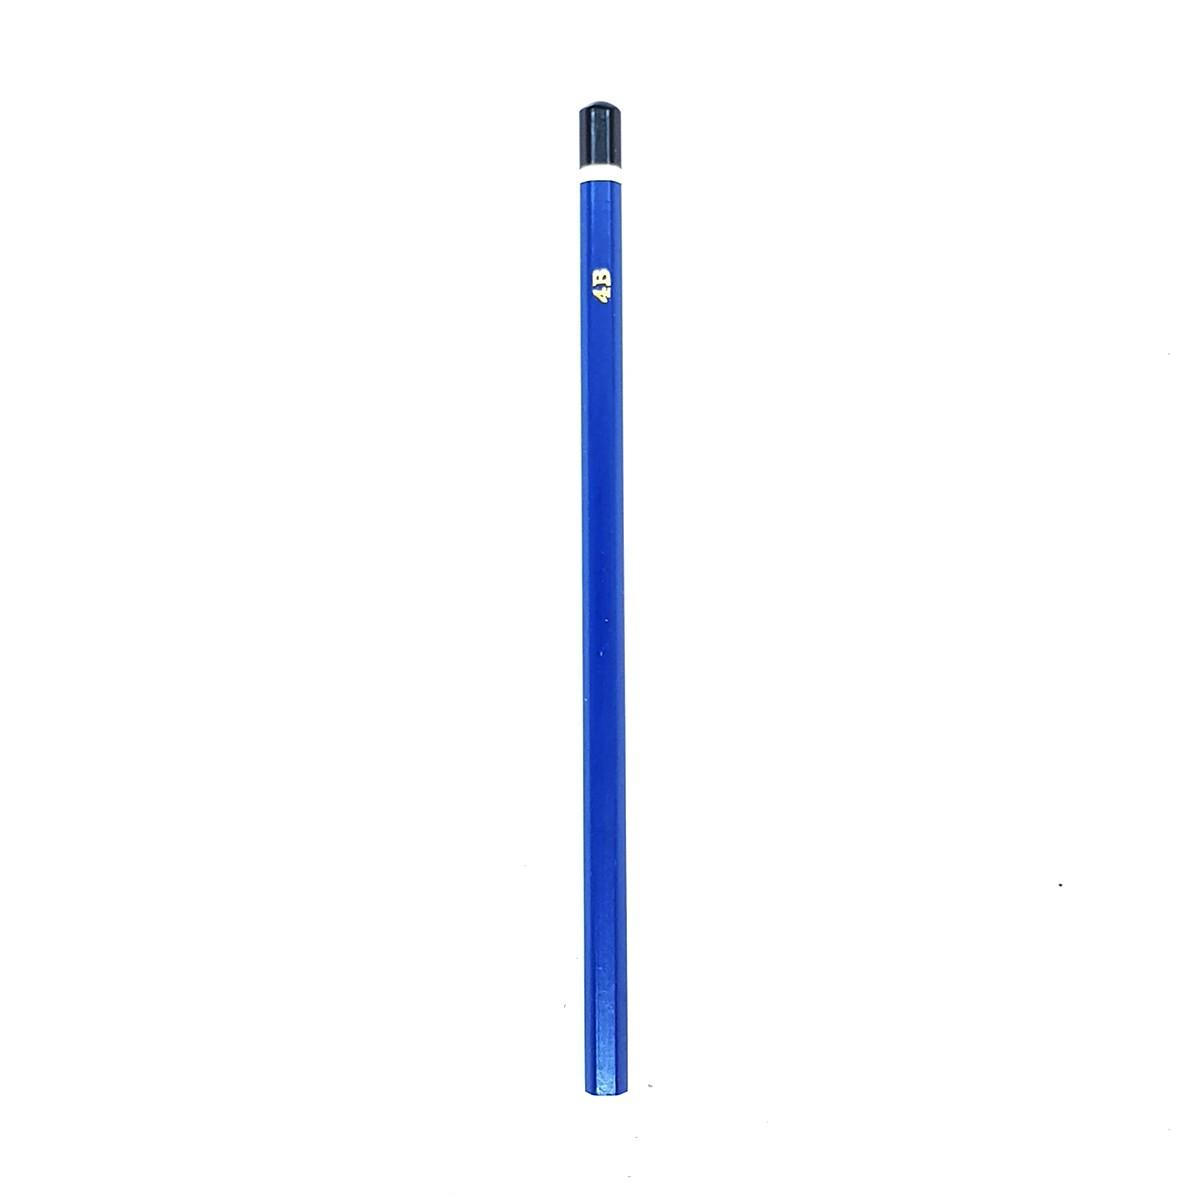 Tegneblyant 4B blå